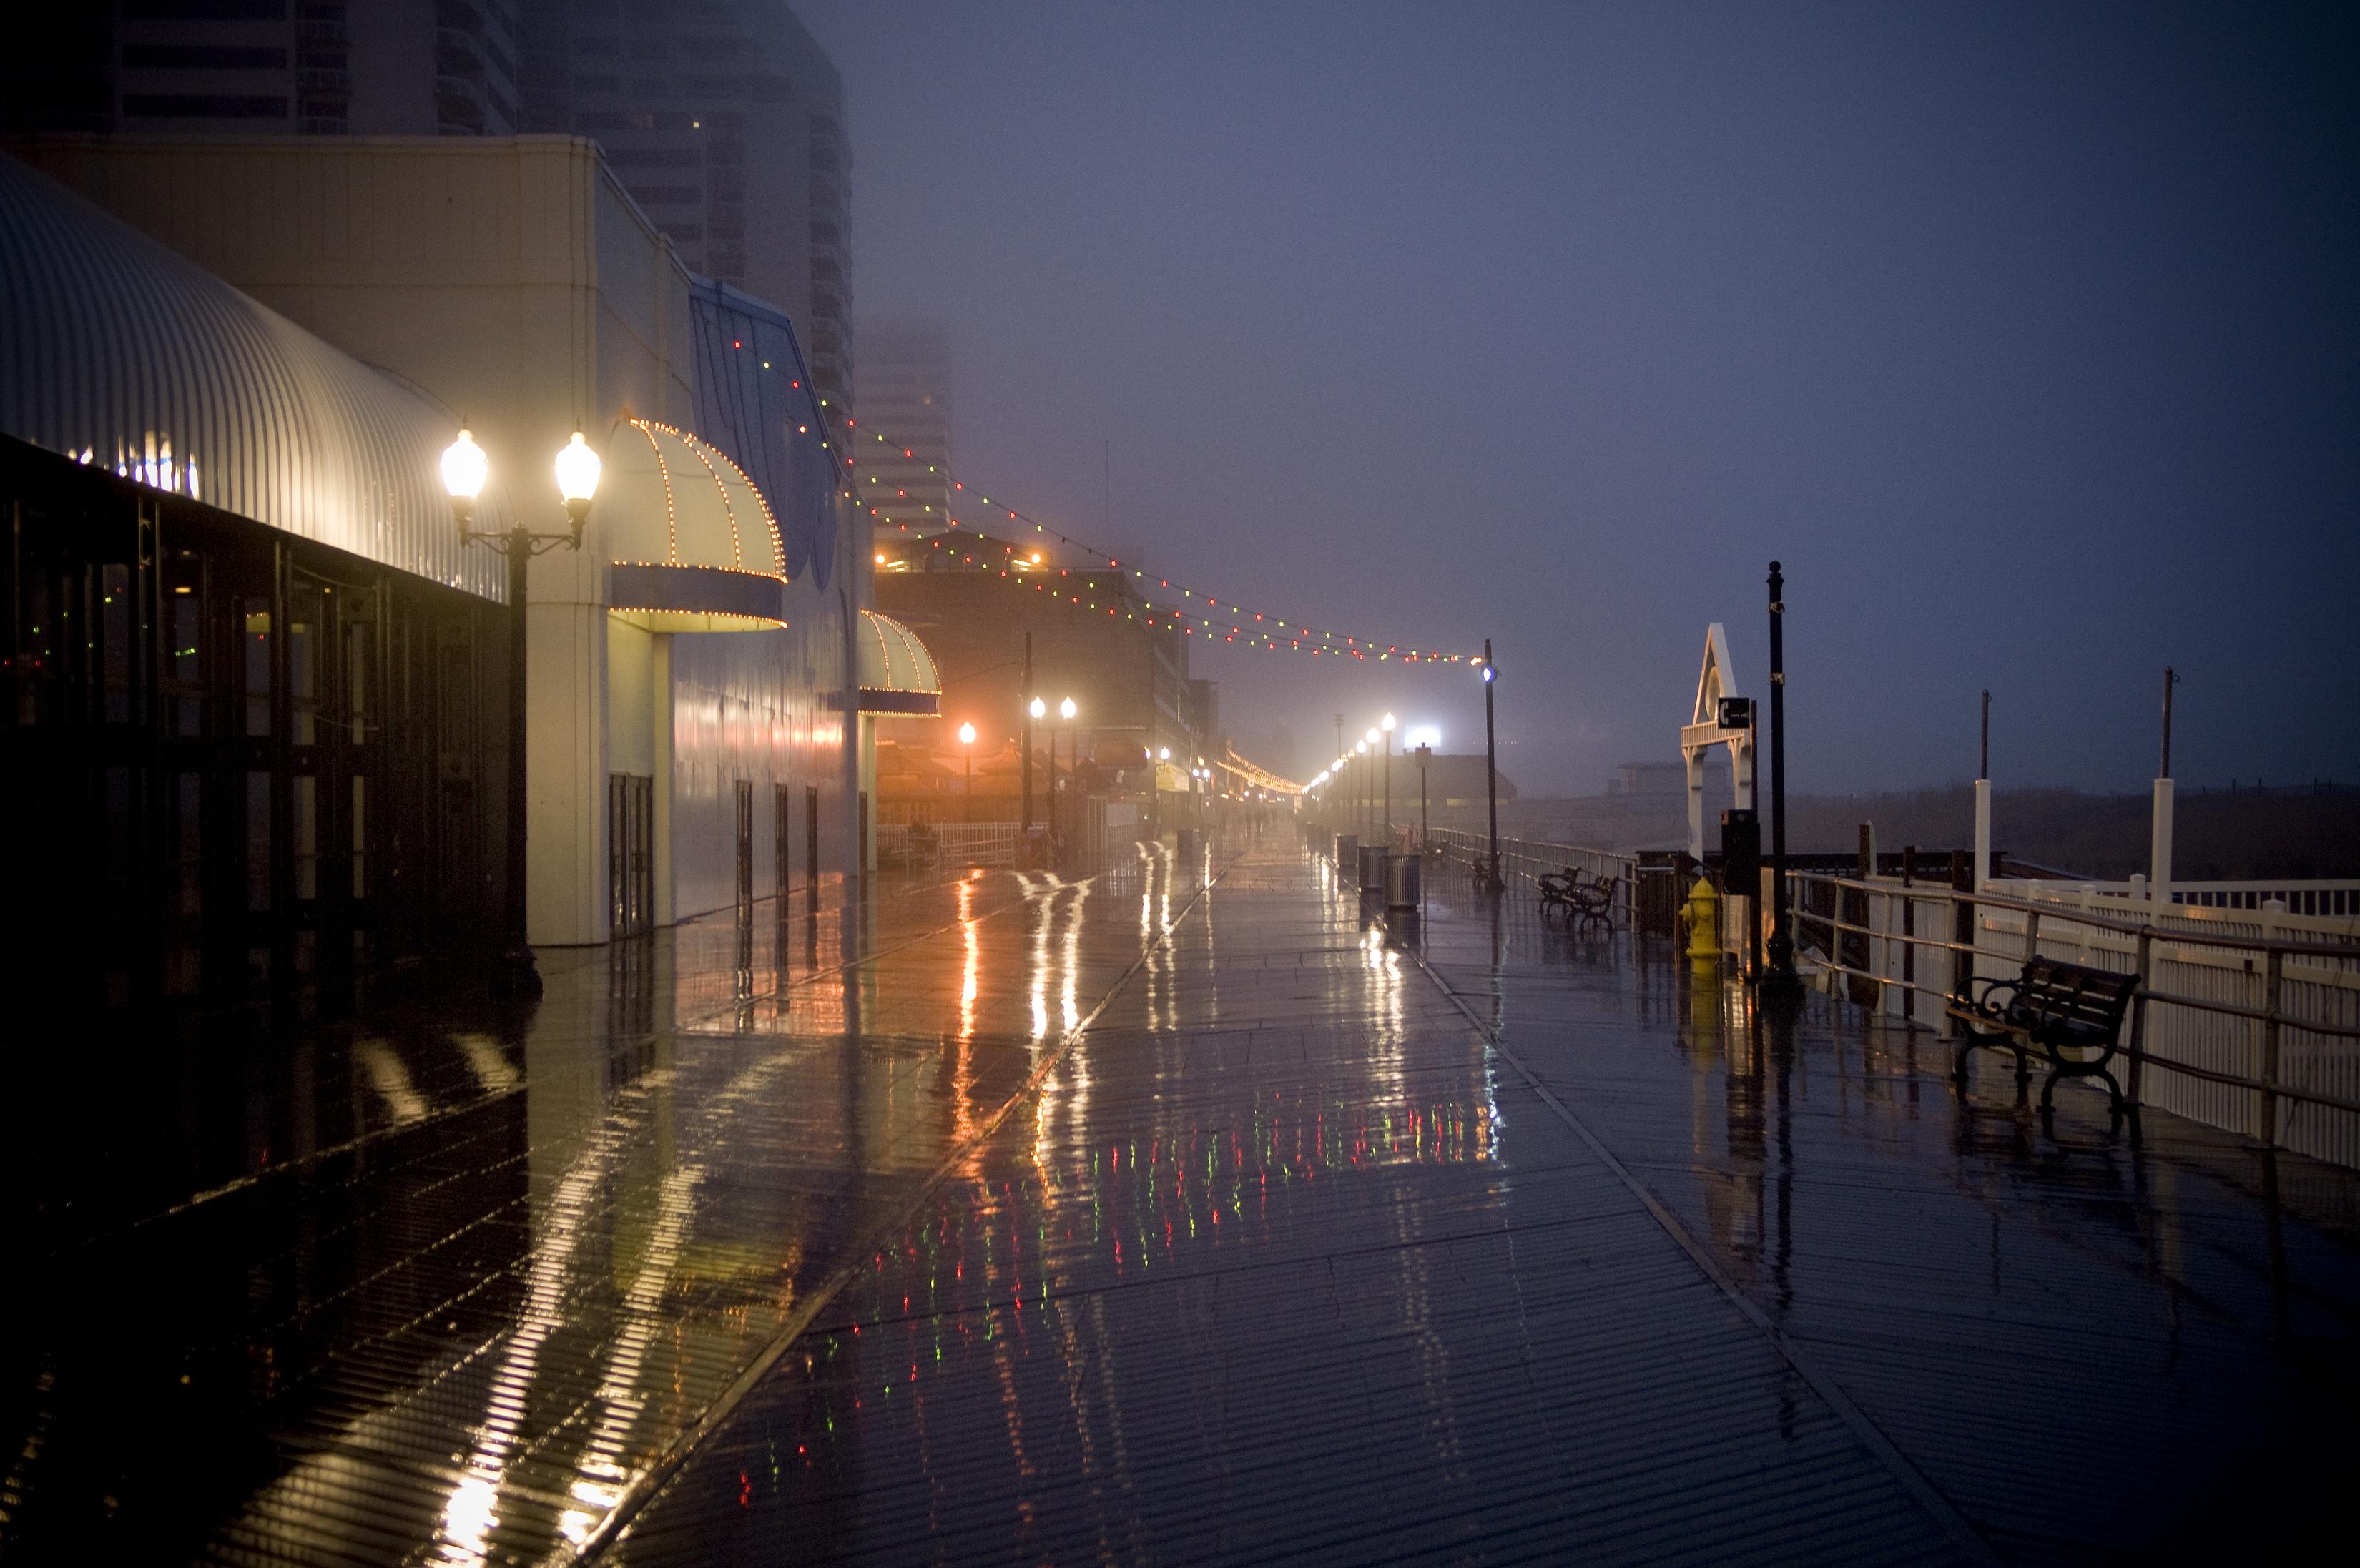 A damp view of Atlantic City's boardwalk.